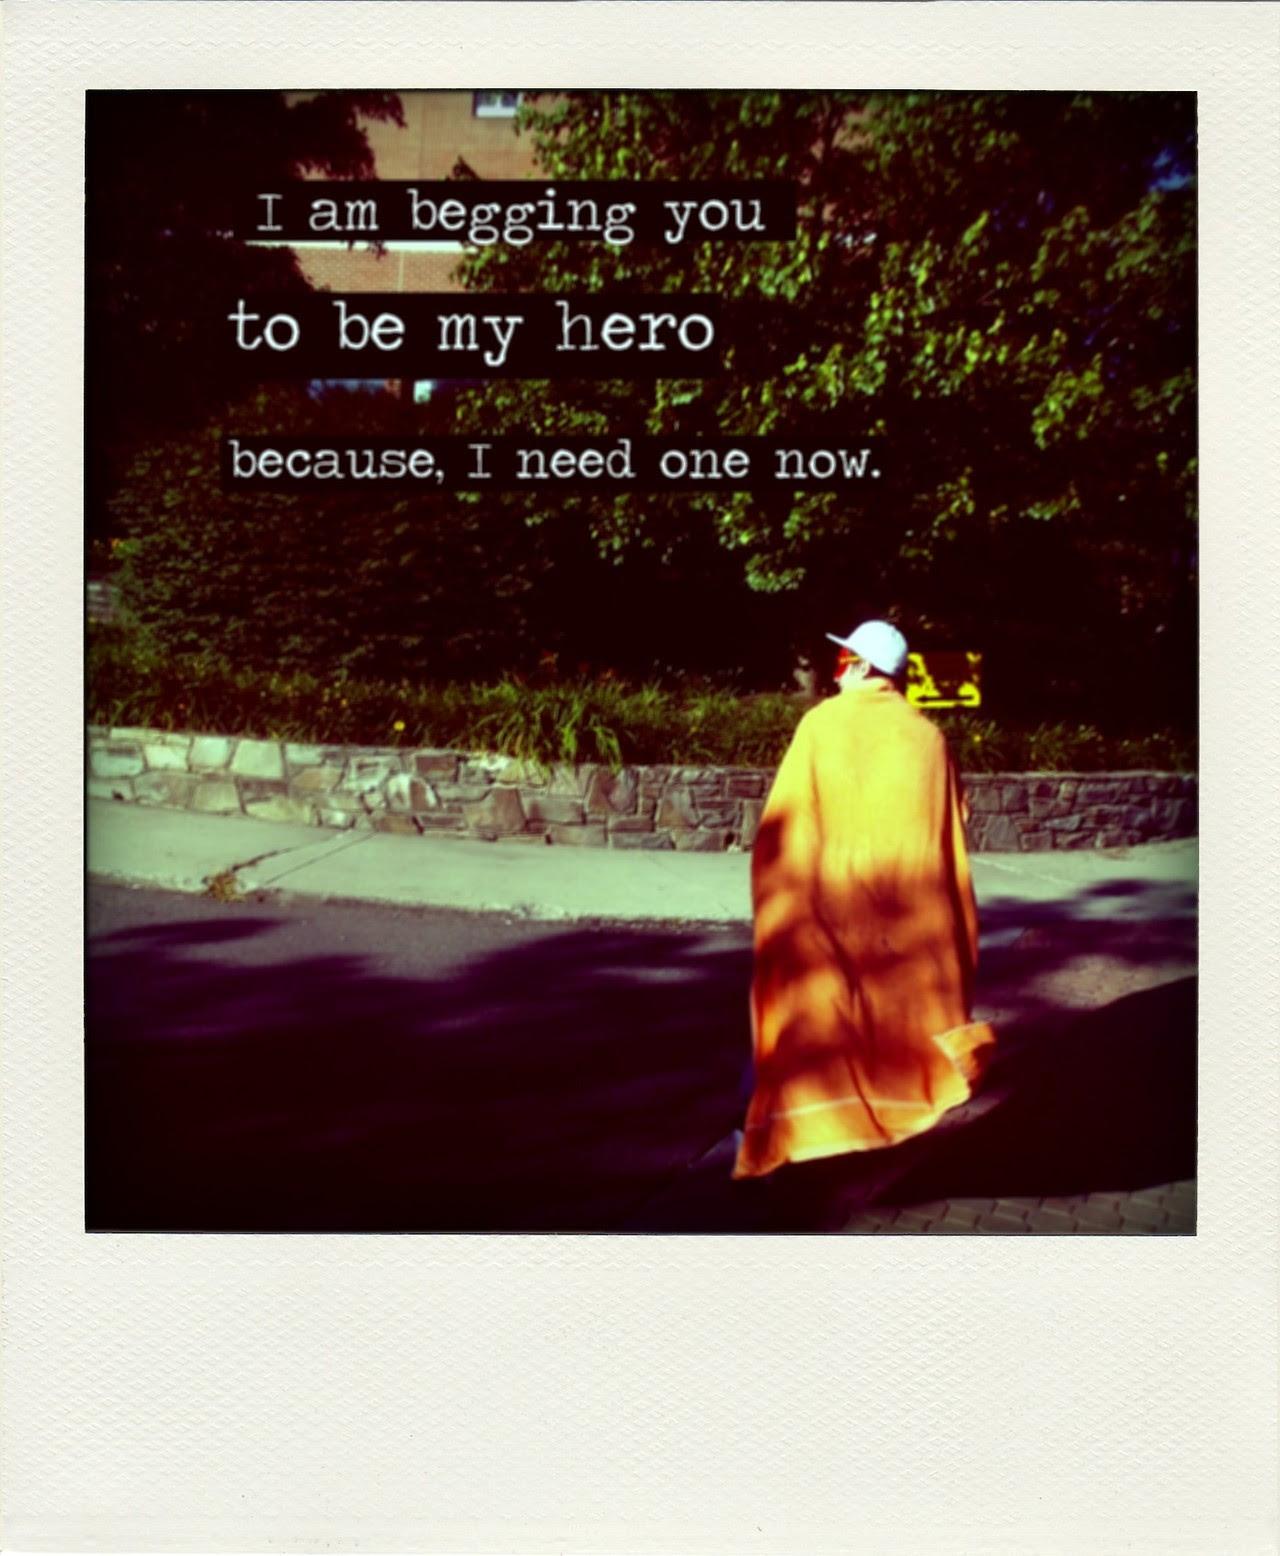 http://24.media.tumblr.com/tumblr_m6g30a7fMw1qbzun1o1_1280.jpg